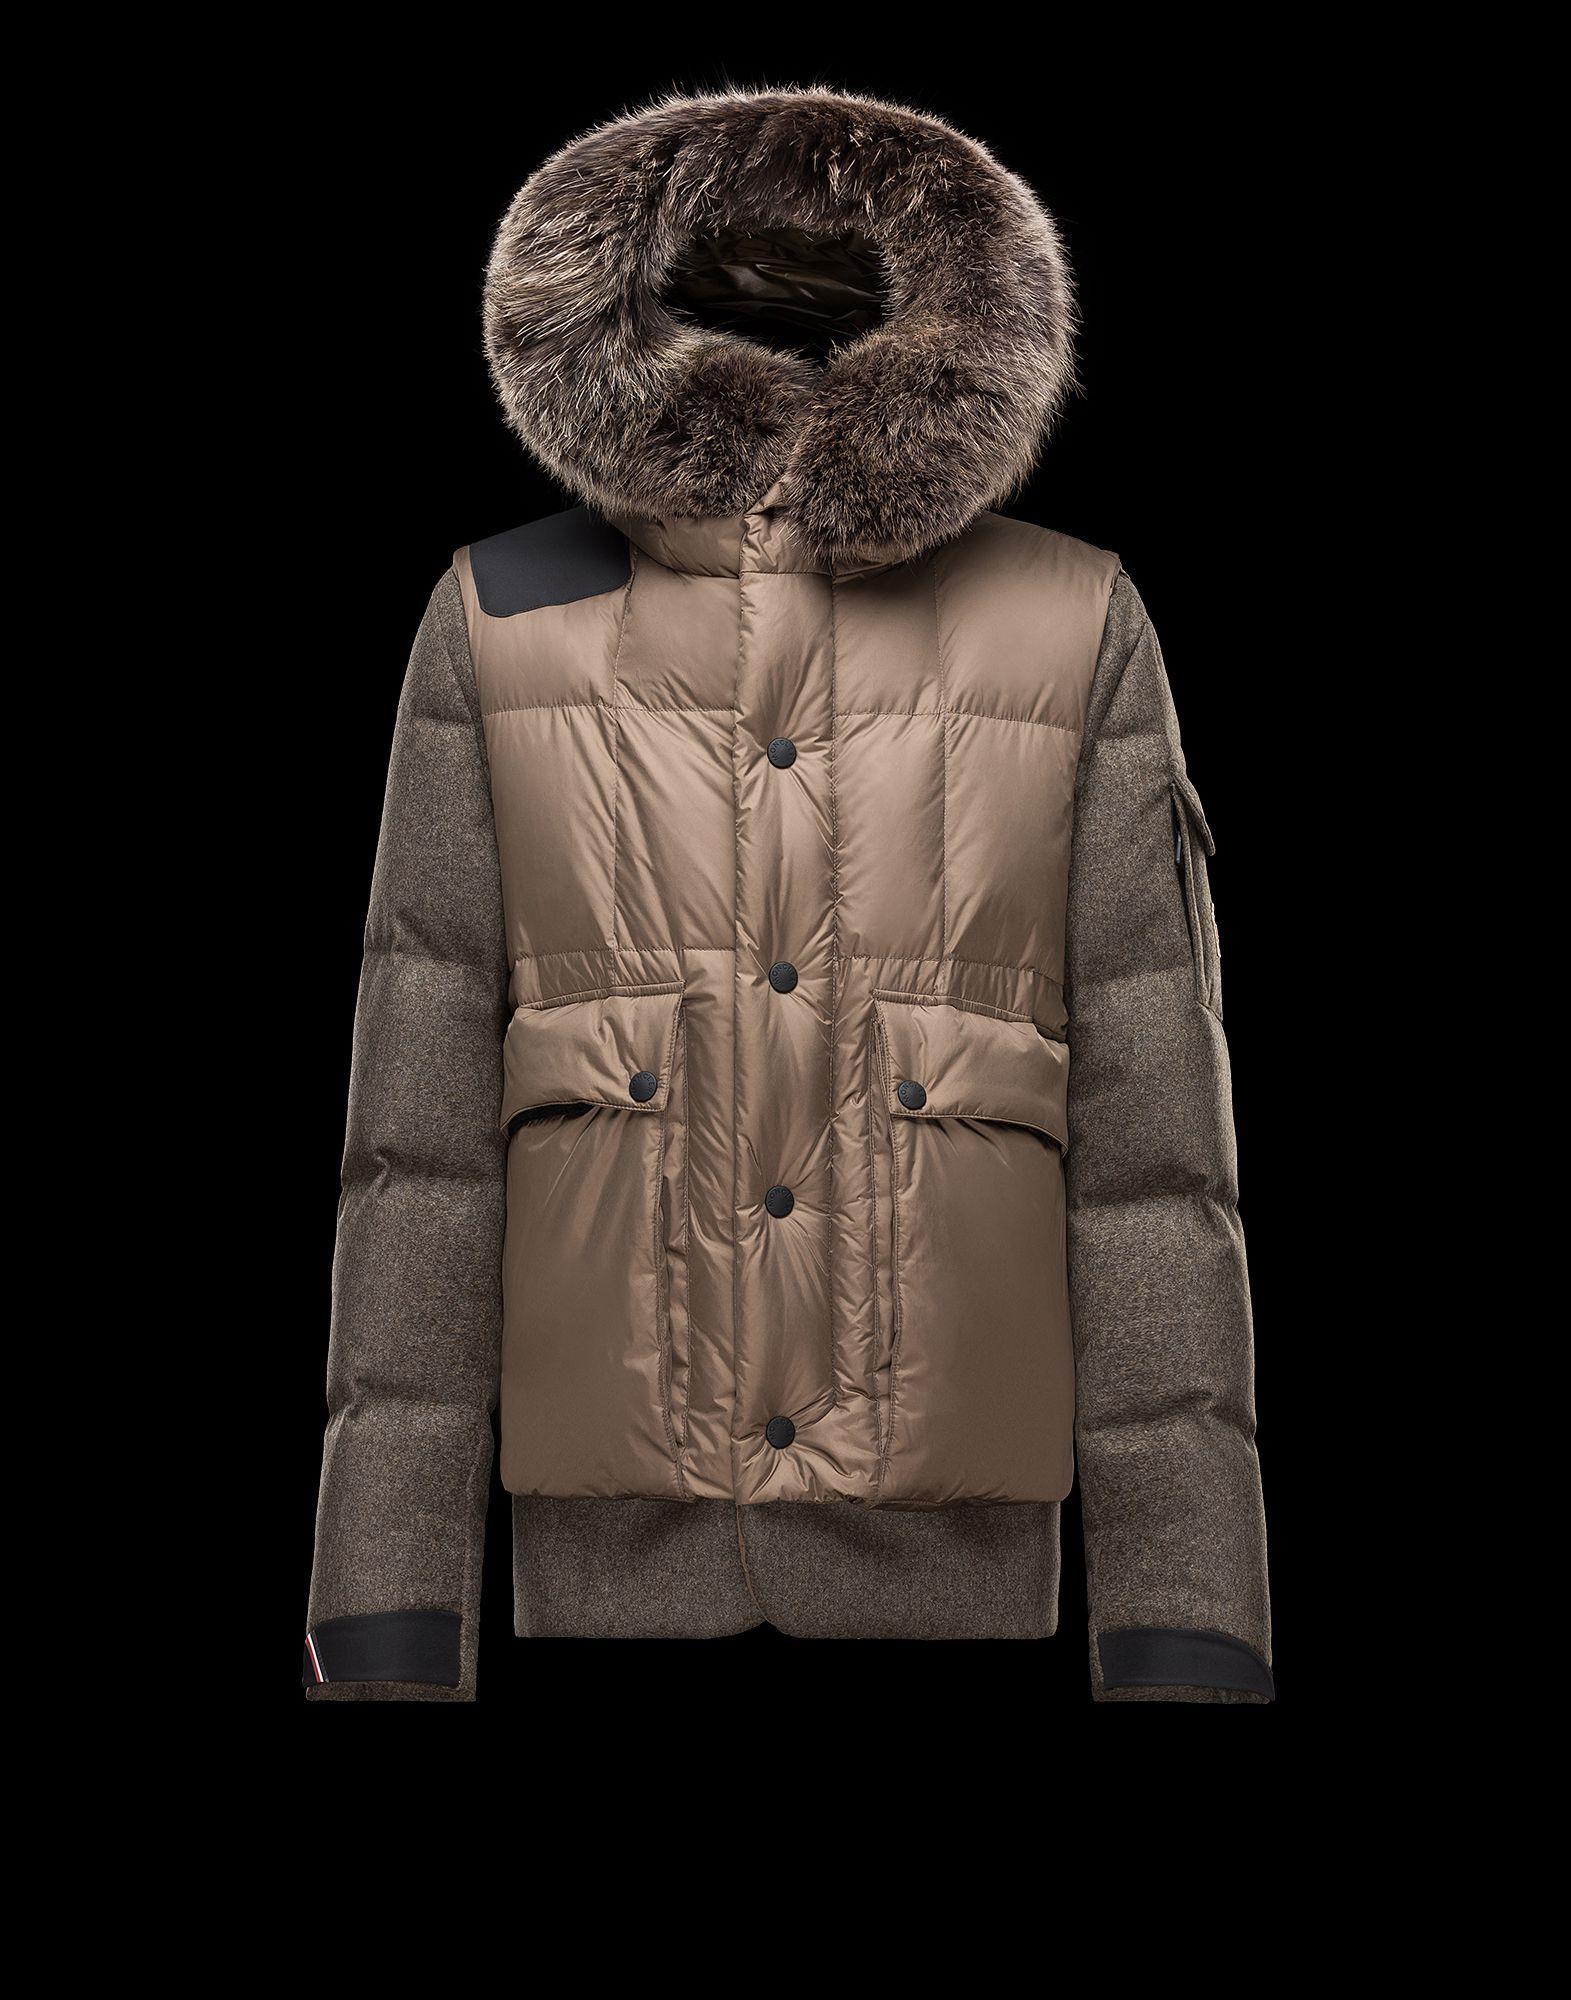 e97f73b49e57 MONCLER COLMIANE   My wardrobe   Pinterest   Winter Coat, Mens ...